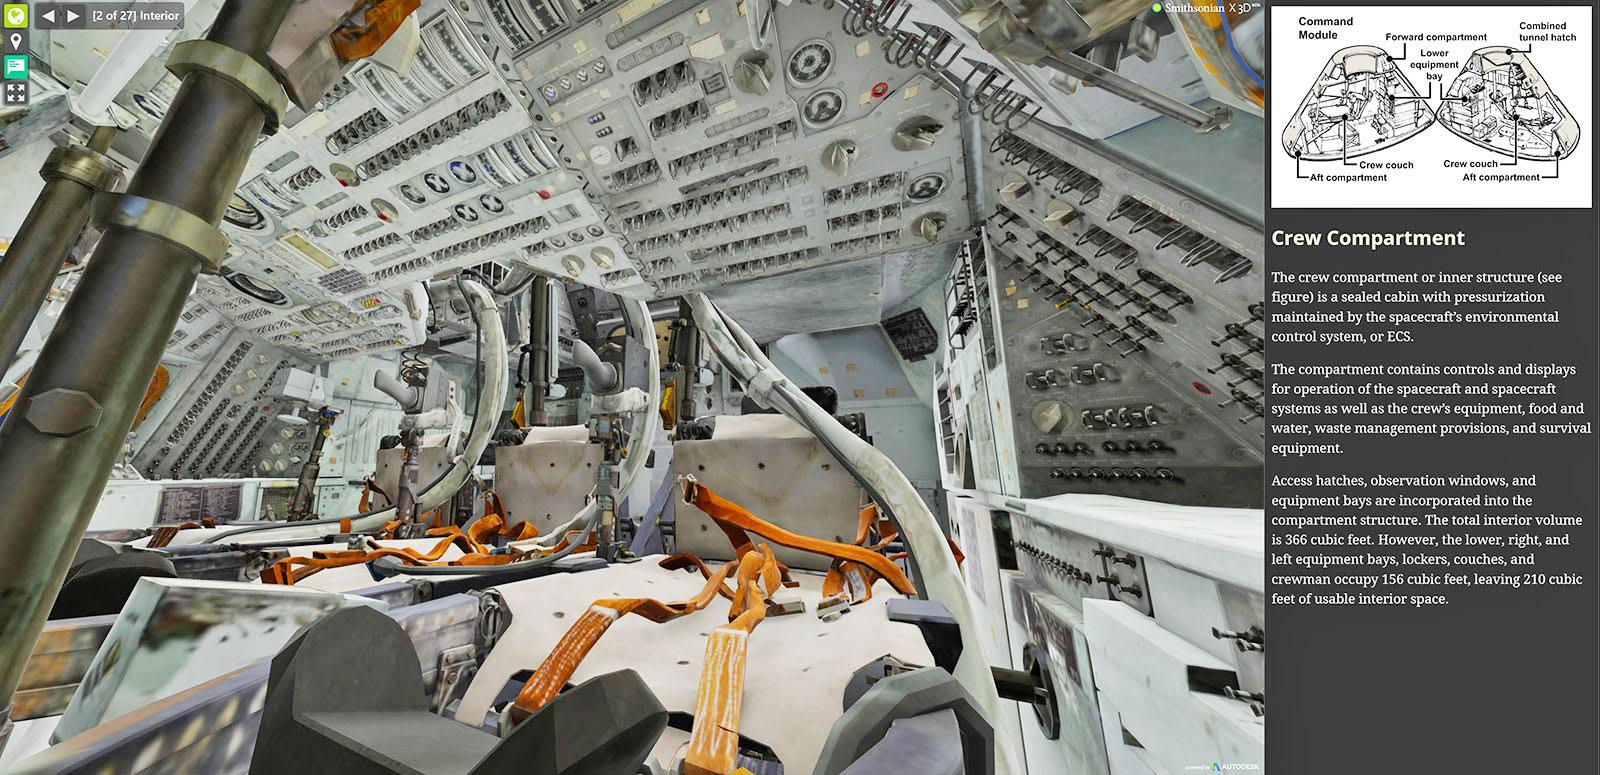 space shuttle interior 3d scan - photo #45